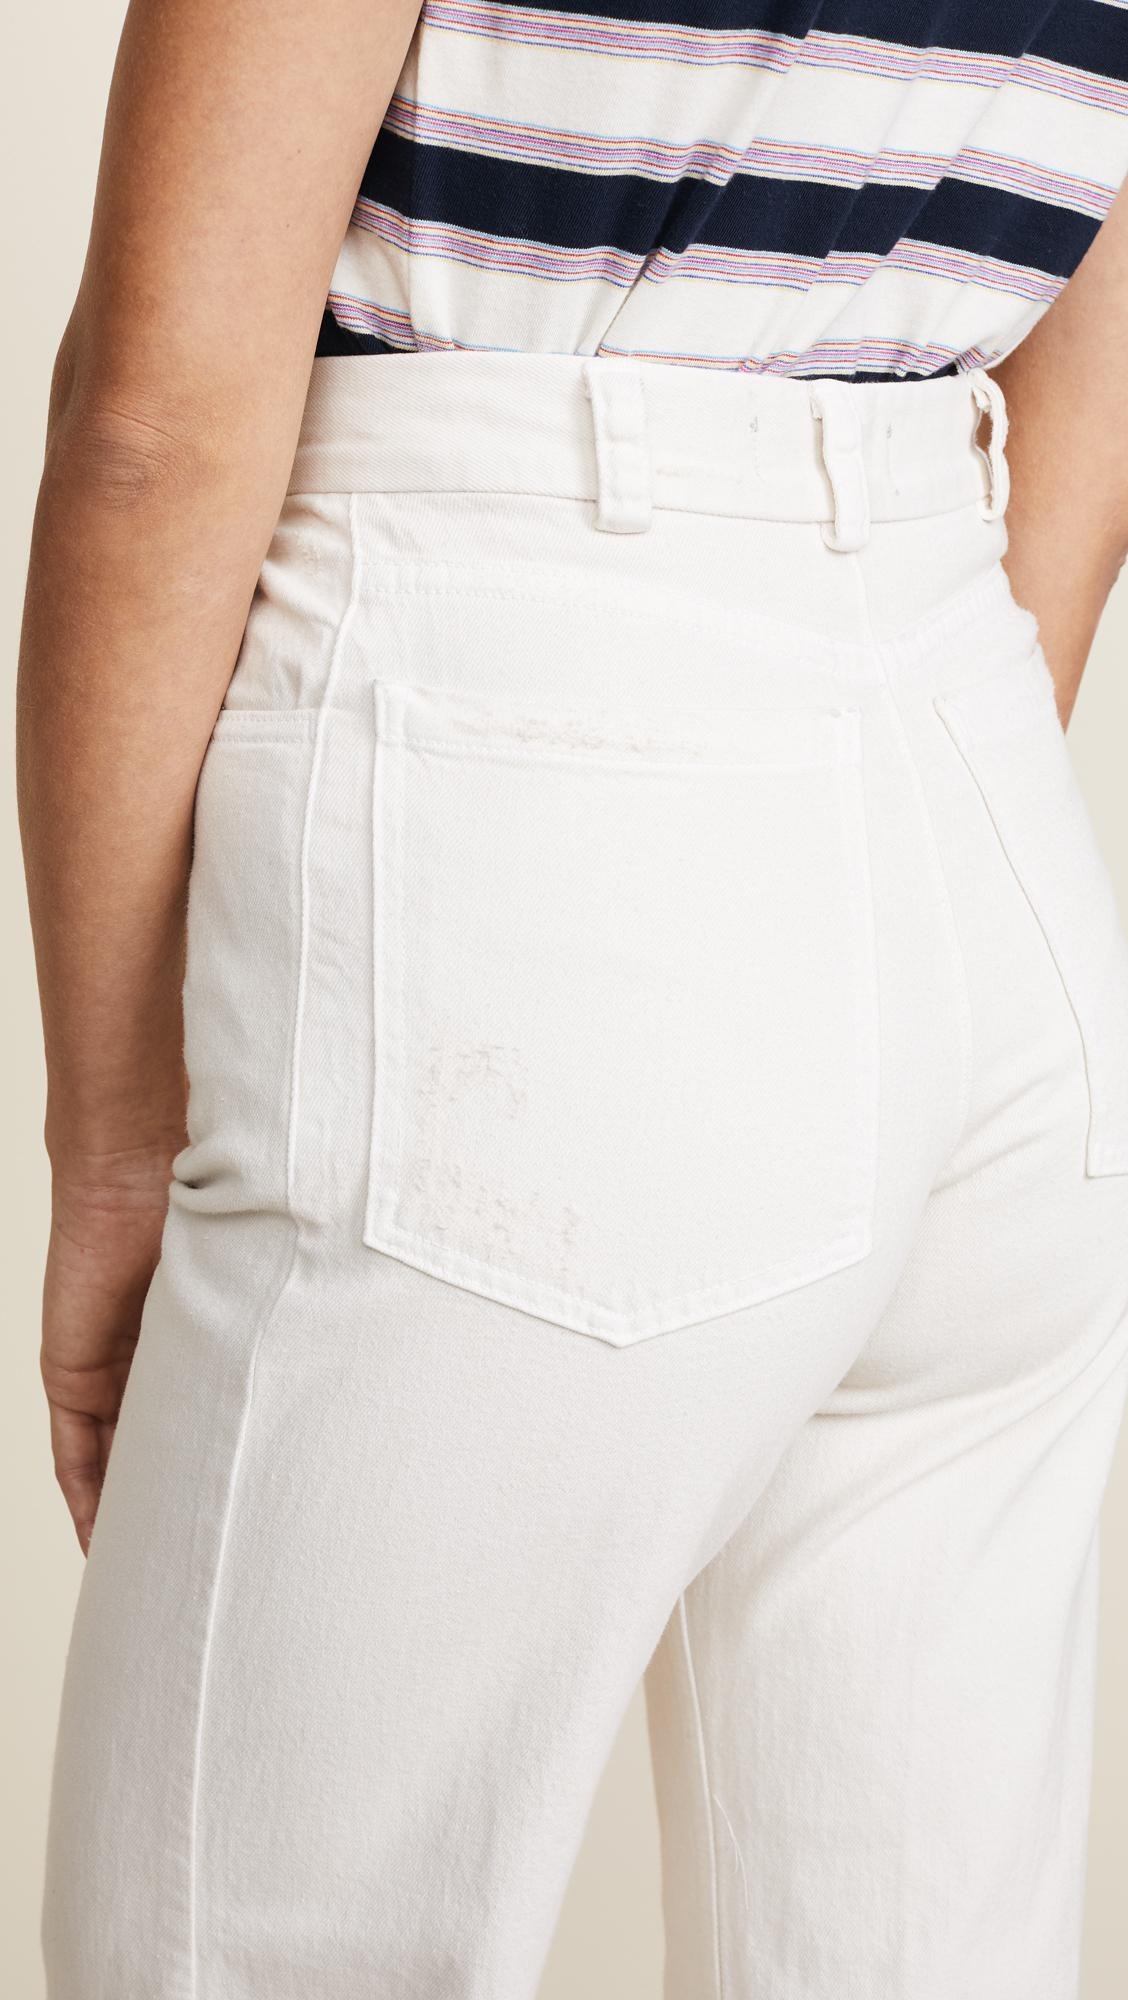 Rachel Comey Legion Jeans in Dirty White Wash (White)